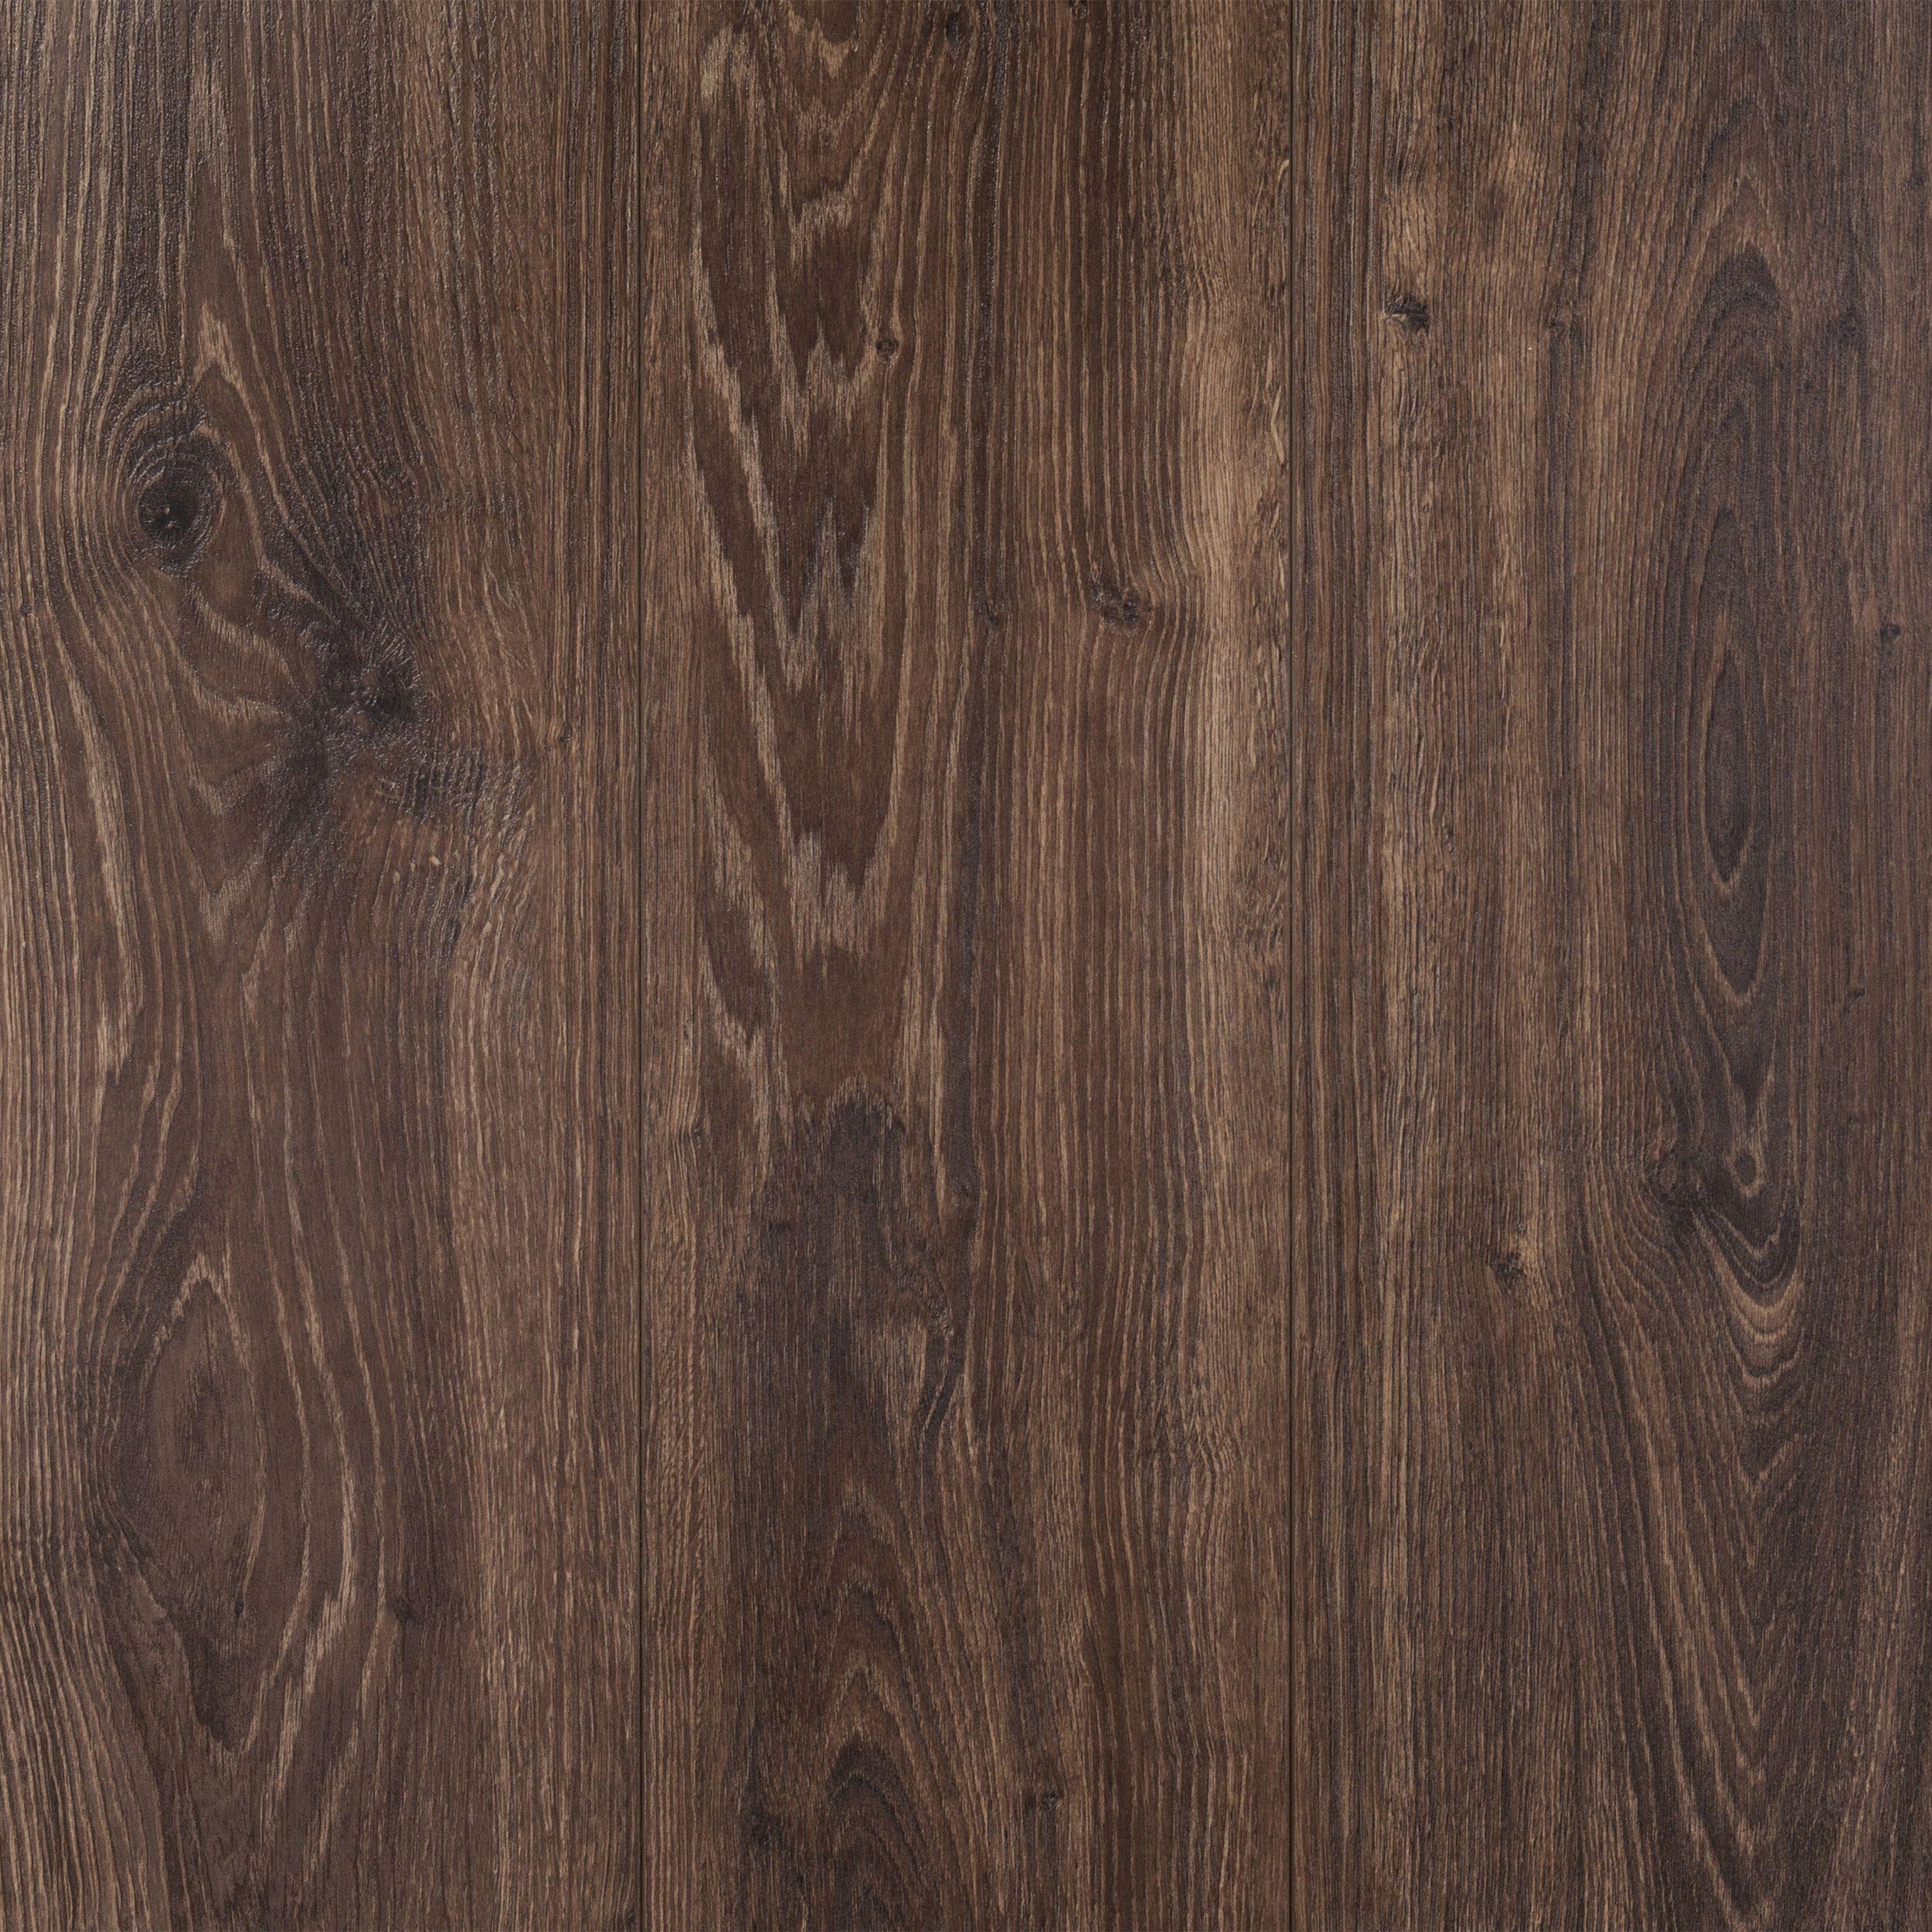 laminate quickstep grey eligna water light resistant waterproof floors image leader flooring varnished oak